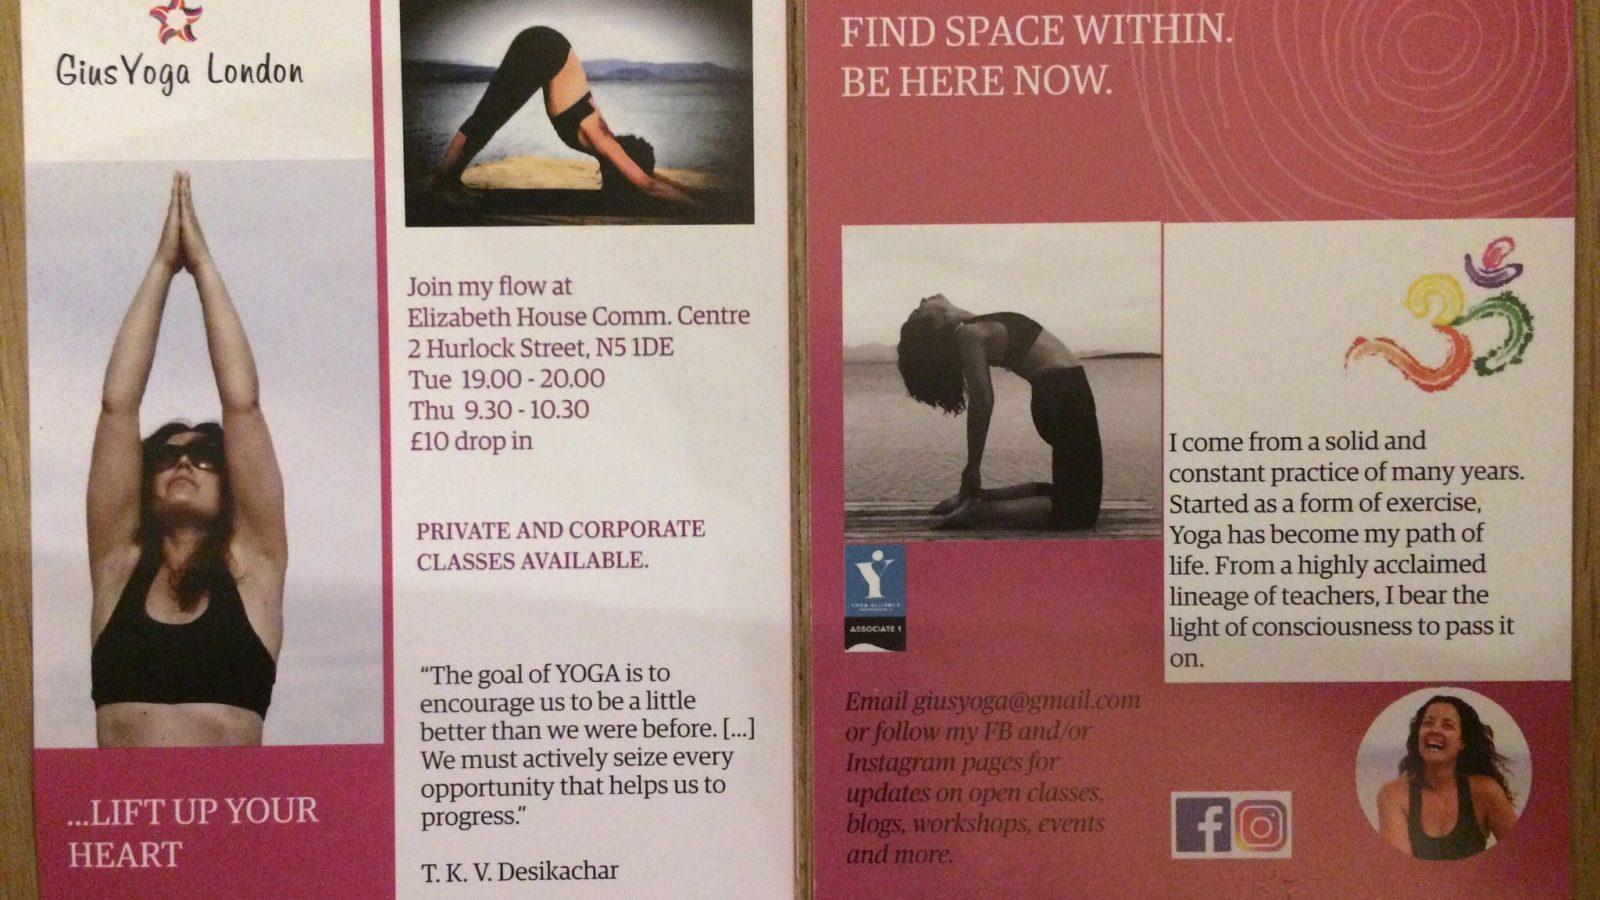 Gius Yoga flyer